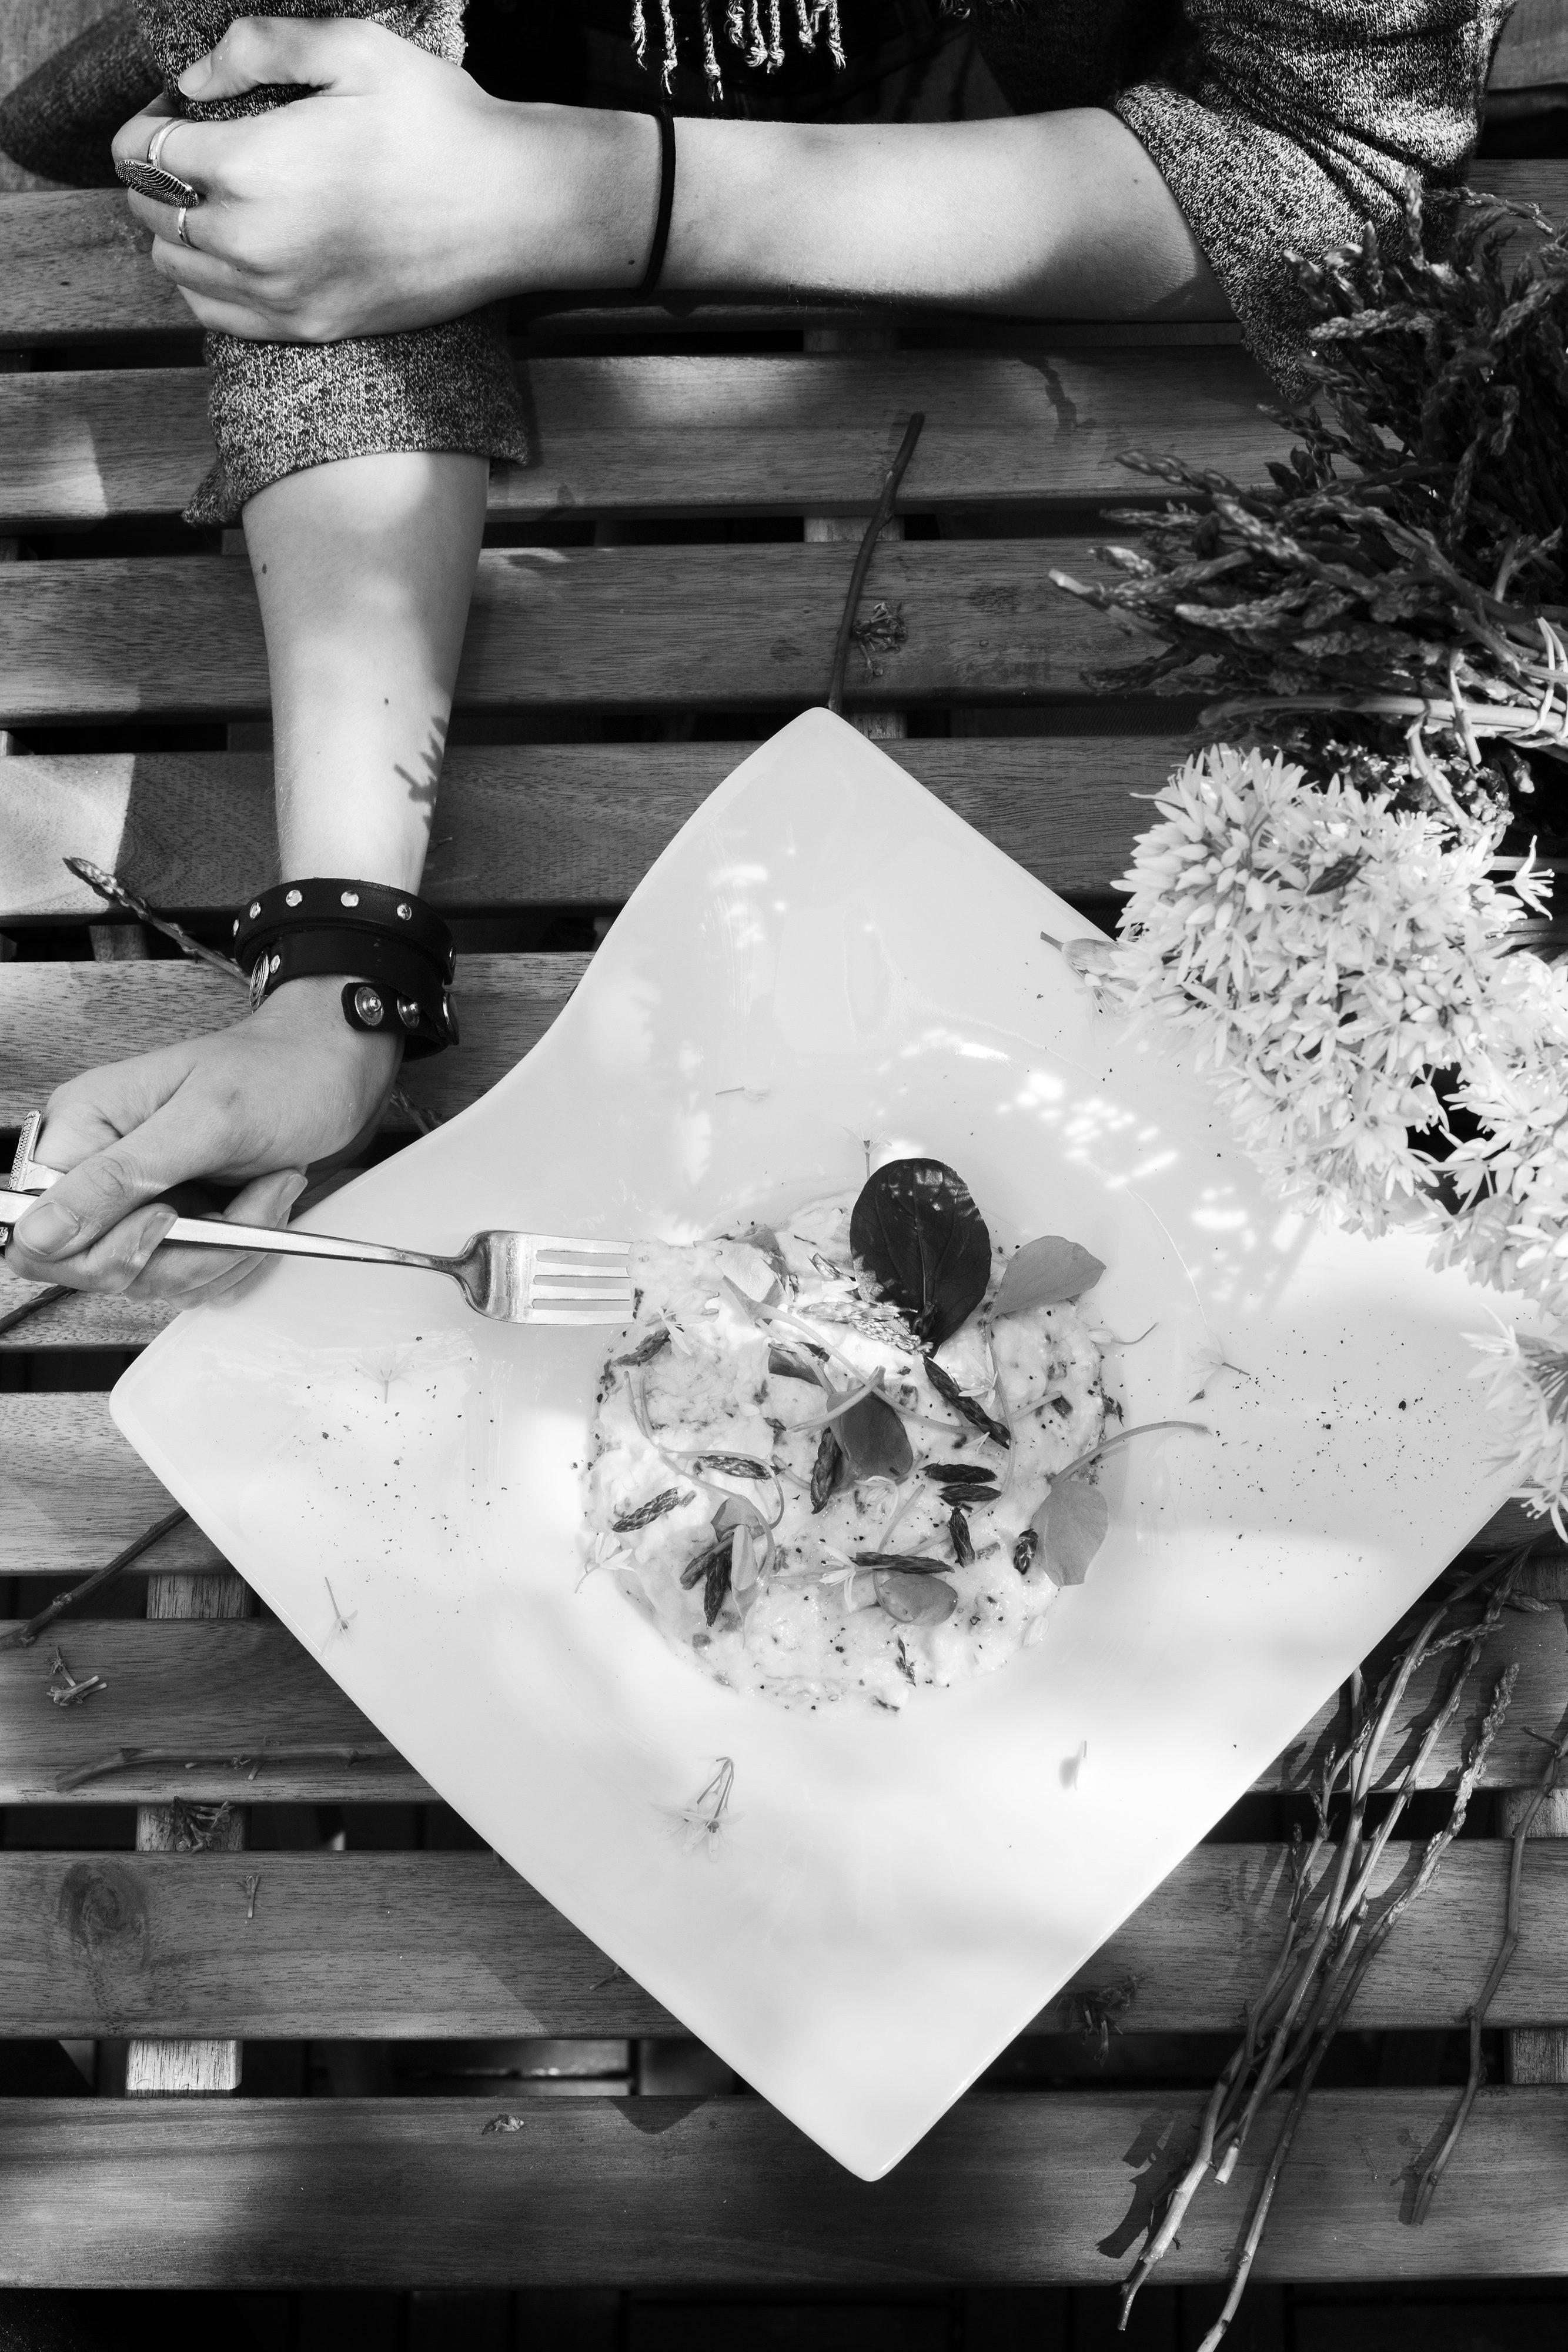 Rijeka, 210416. Novi gastro kutak Pijaca 21 u neposrednoj blizini gradske trznice nudi zanimljiva jela i marende pod vodstvom Denisa Zembe i uz vodjenje Rade Malobabica. Foto: Berislava Picek / CROPIX